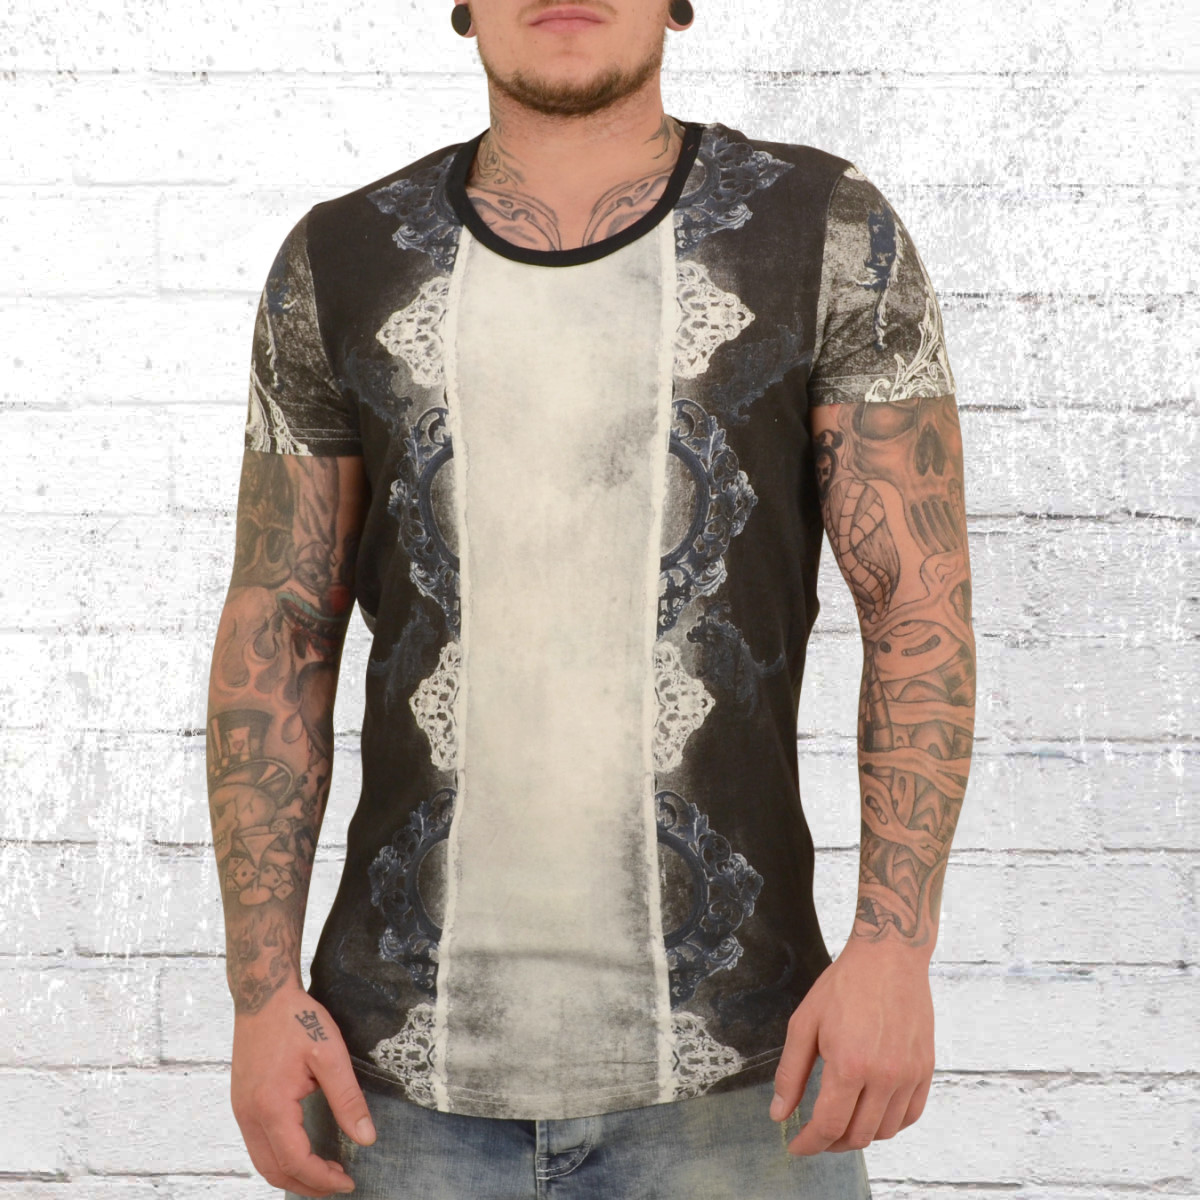 ac6373216afb Jetzt bestellen   Trueprodigy Herren T-Shirt Dynasty weiss schwarz ...